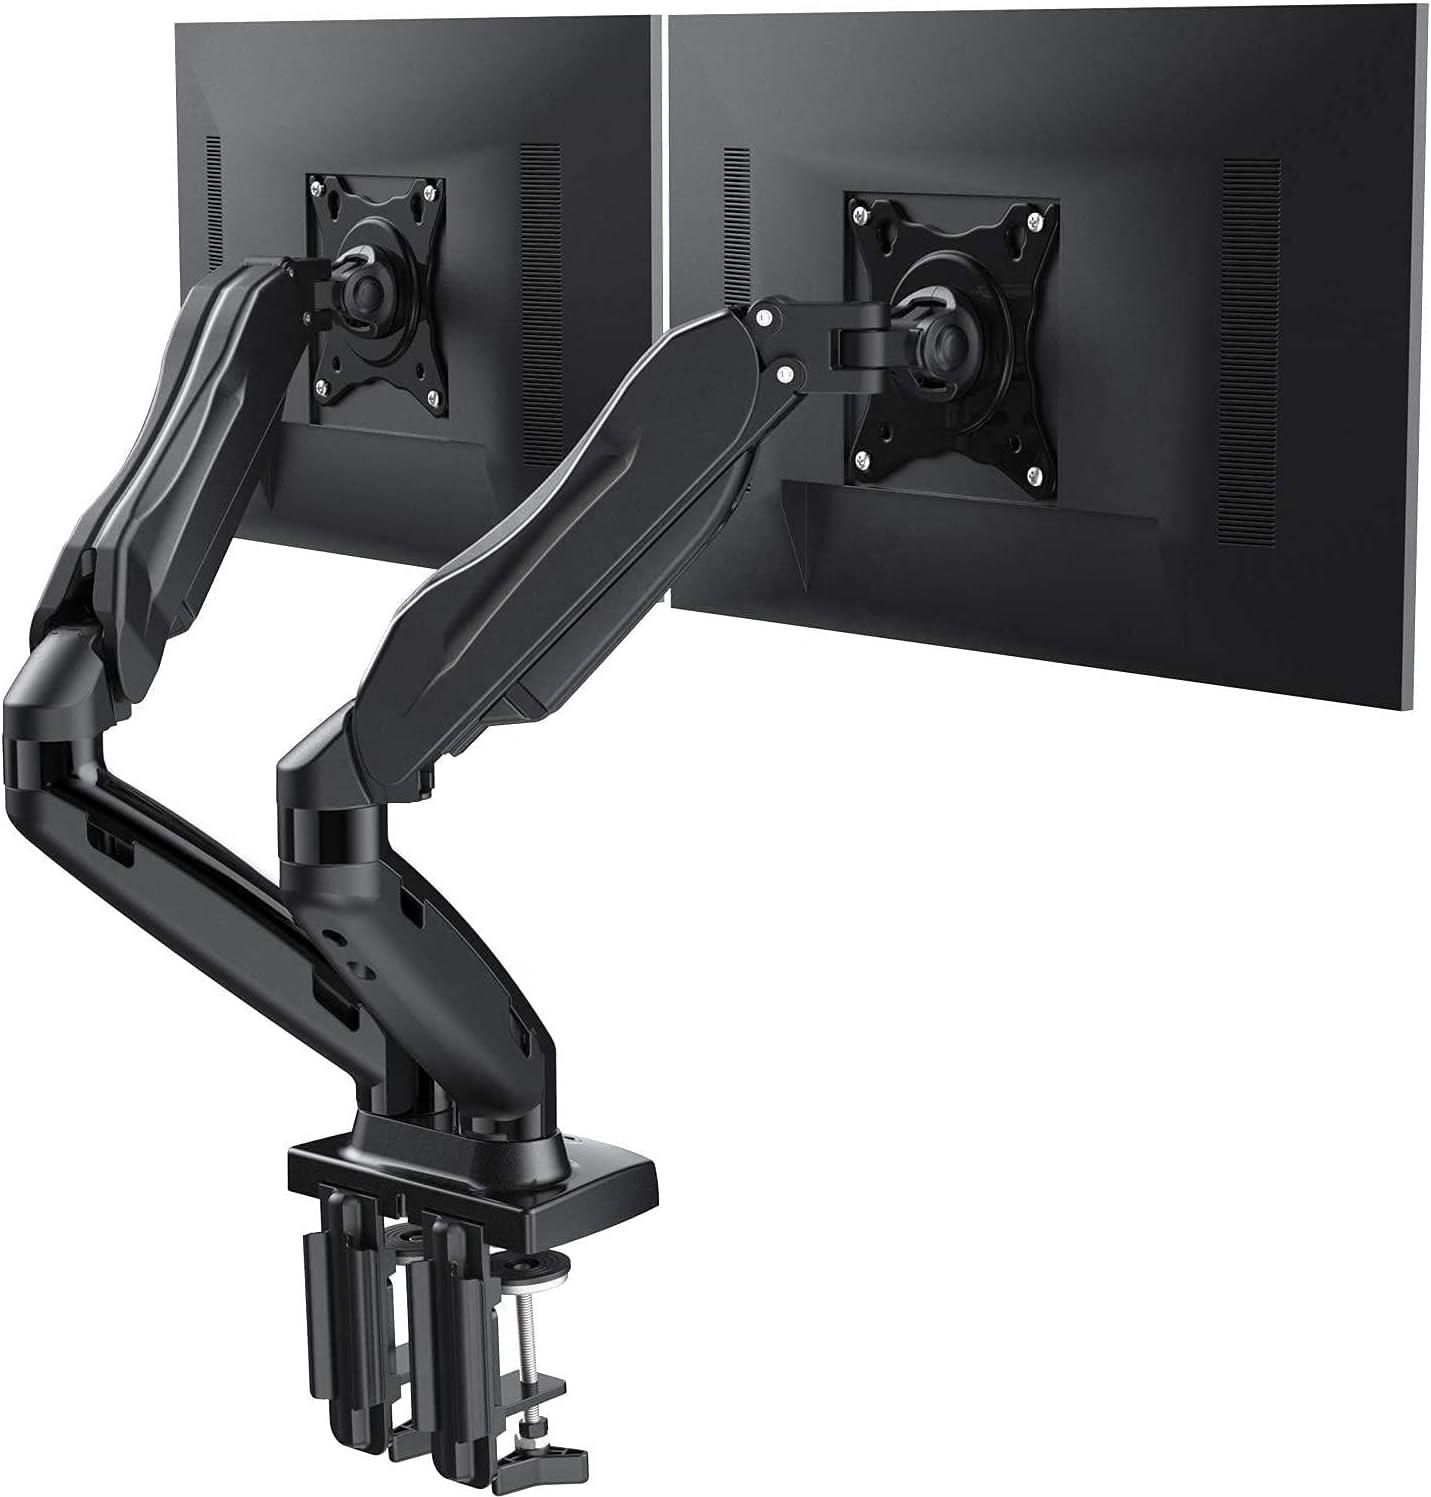 El Paso Mall Dual Monitor Stand - Adjustable Swivel Mount Cheap bargain Spring Desk